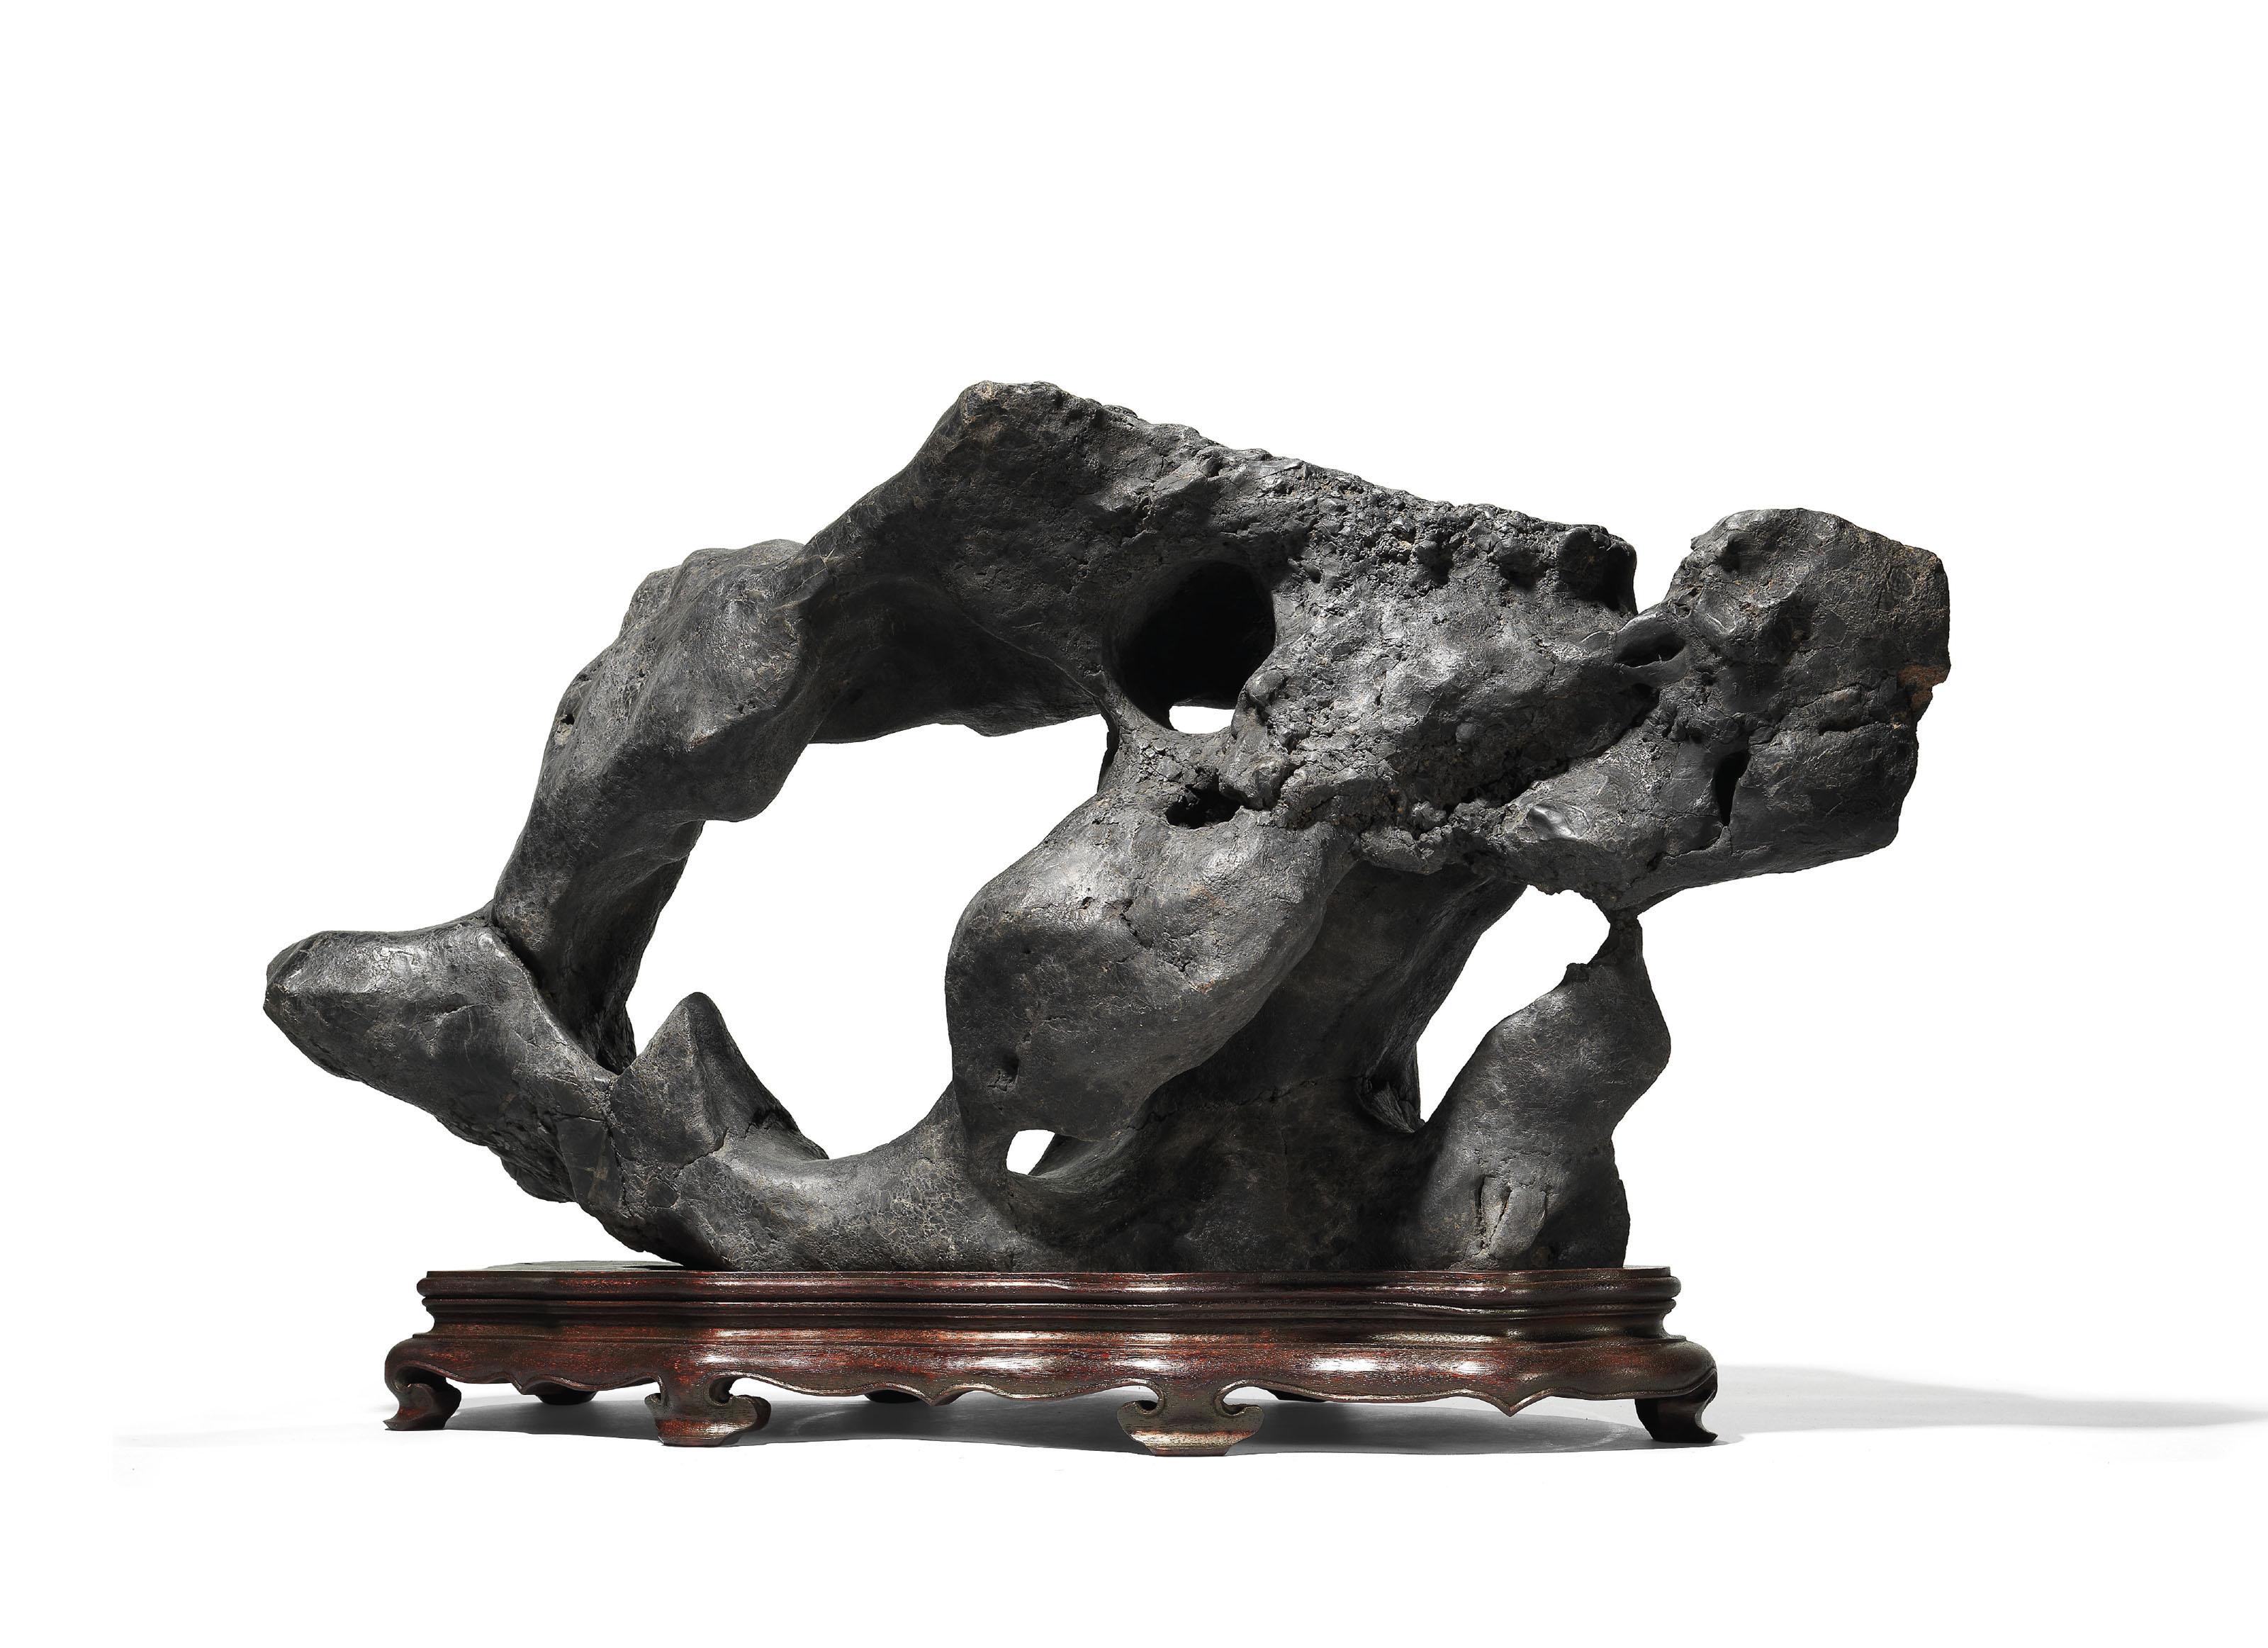 AN INSCRIBED SCHOLAR'S ROCK